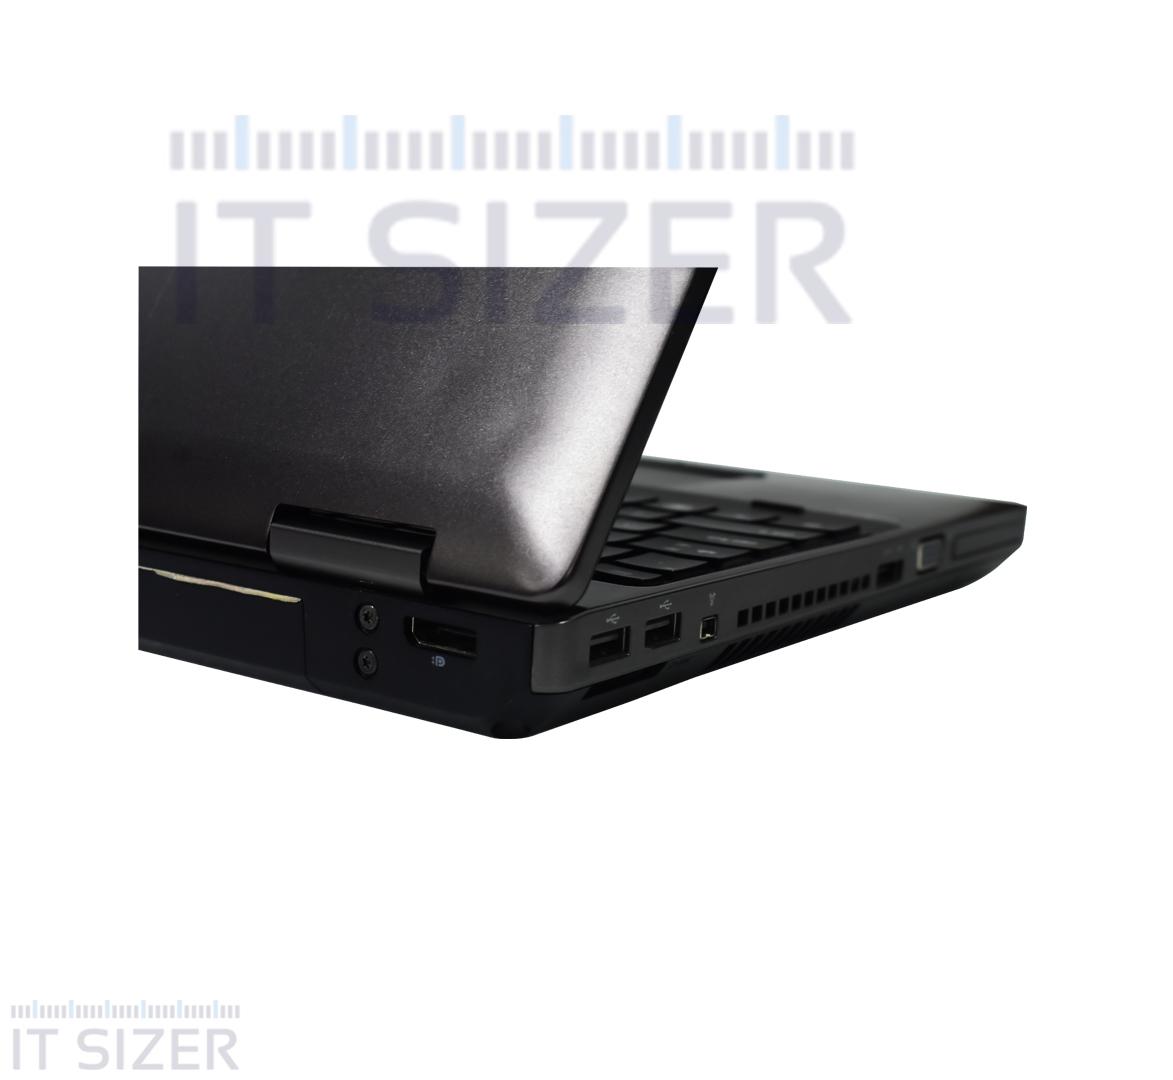 HP 6570B Business Laptop, Intel Core i7 CPU, 8GB DDR3 SODIMM RAM, 256GB SSD 2.5, 15 inch Display, Windows 10 pro (Renewed)